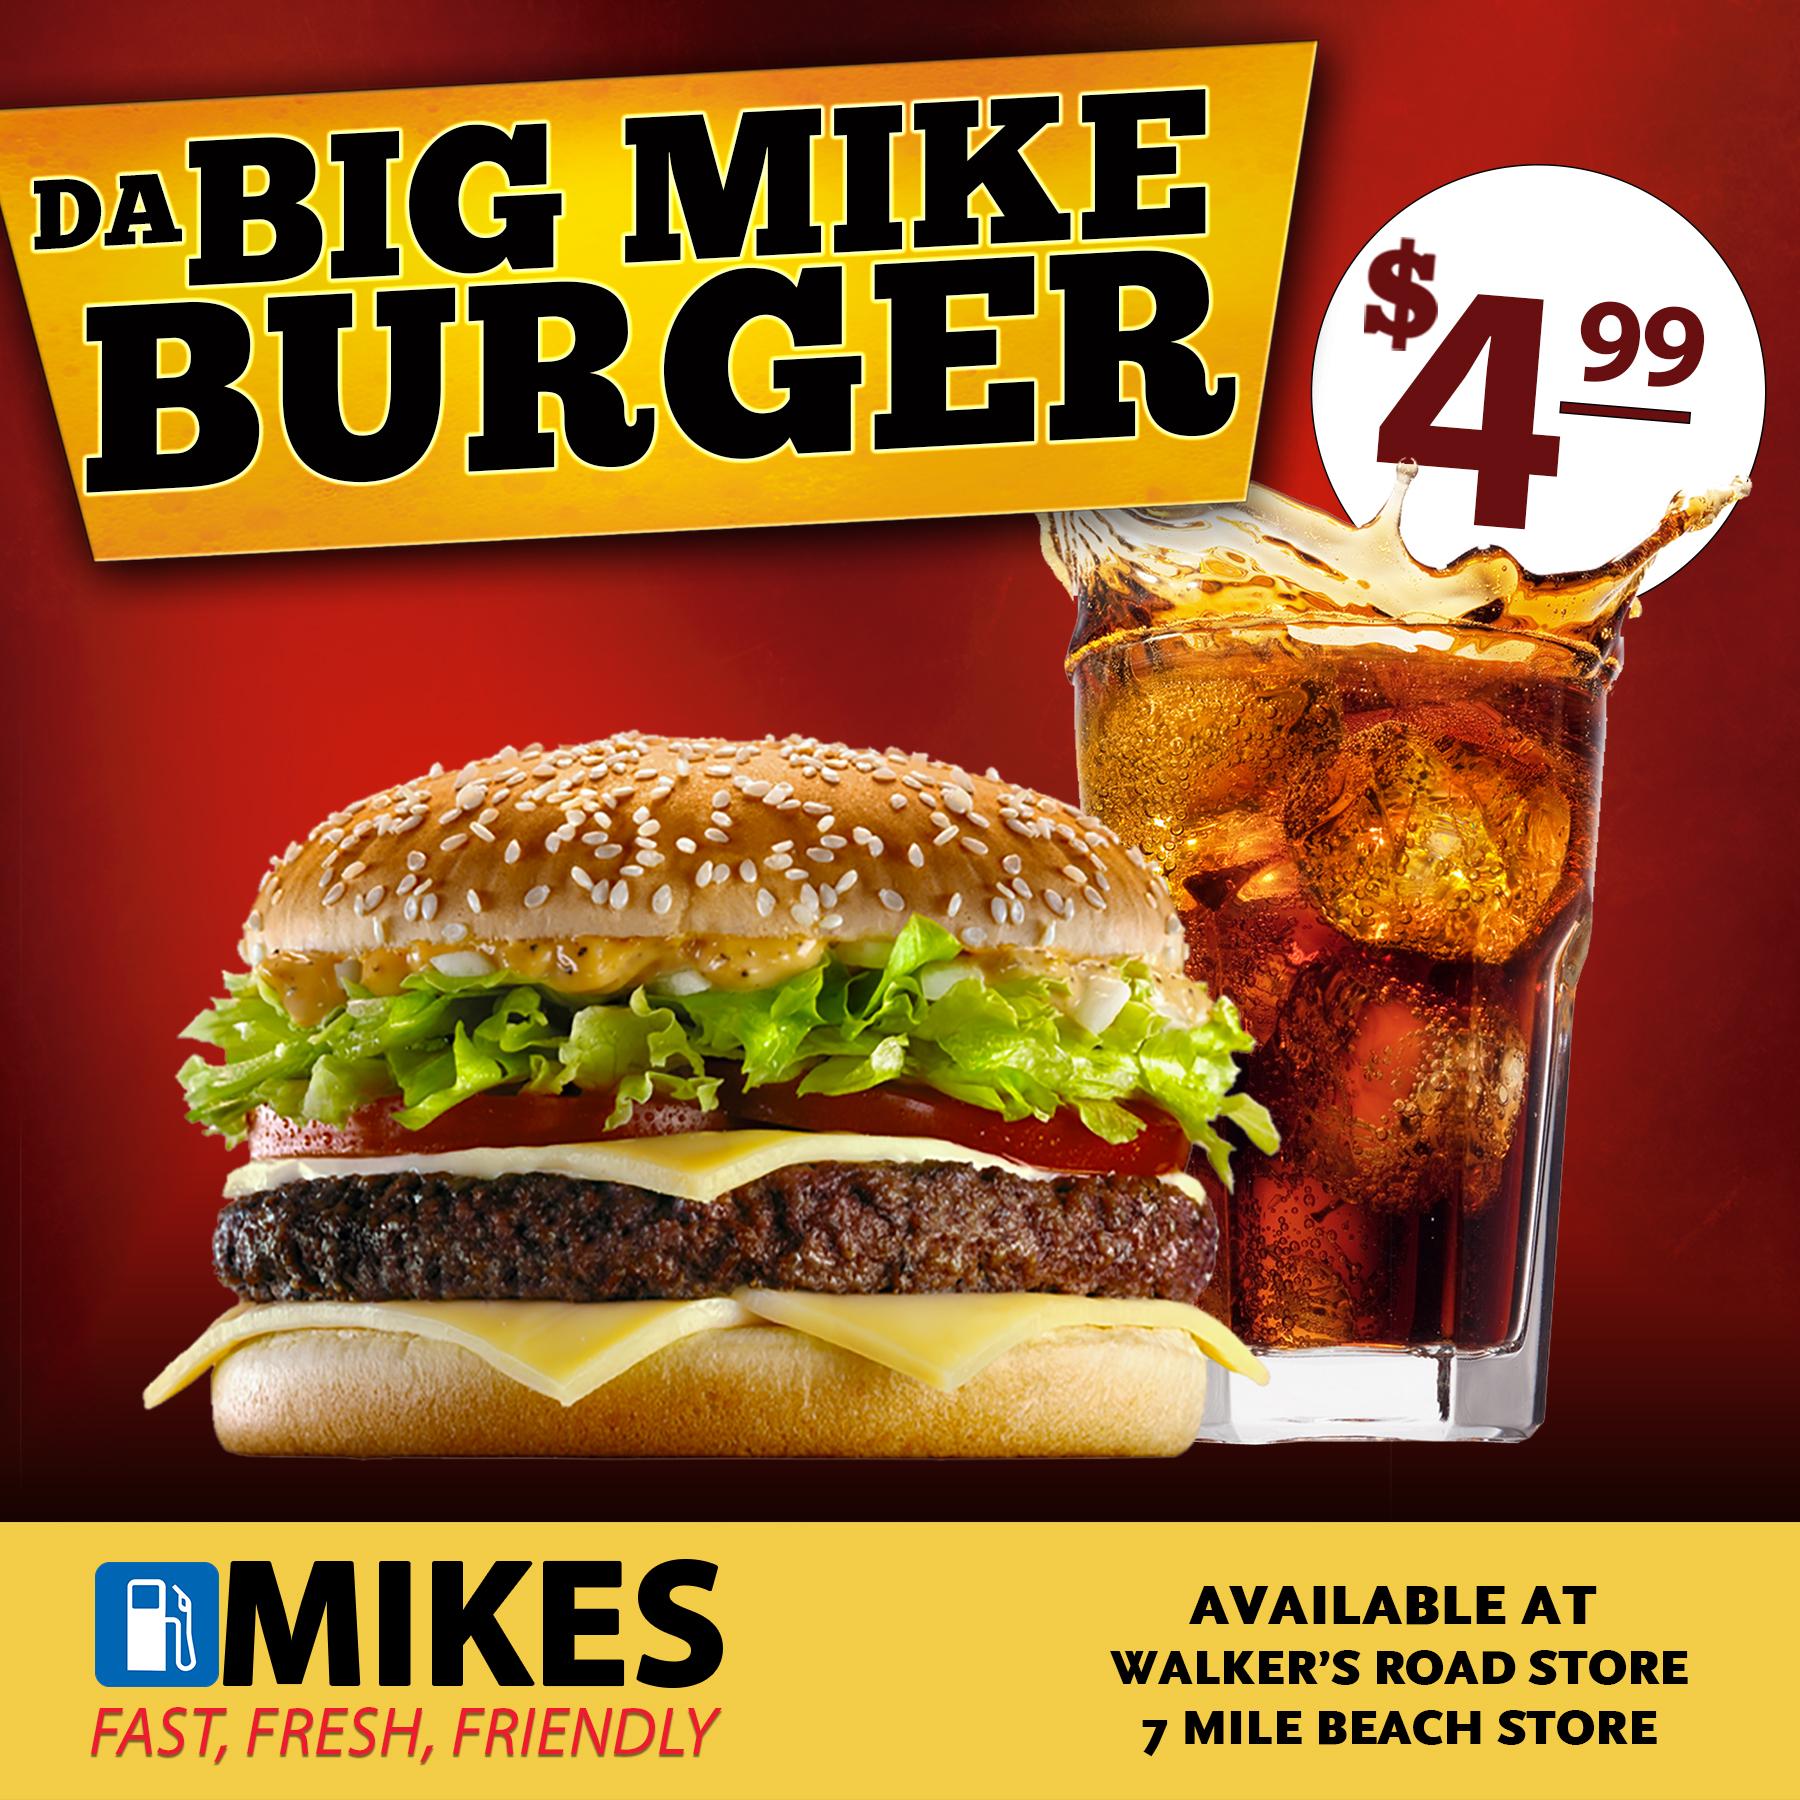 Da Big Mike Burger